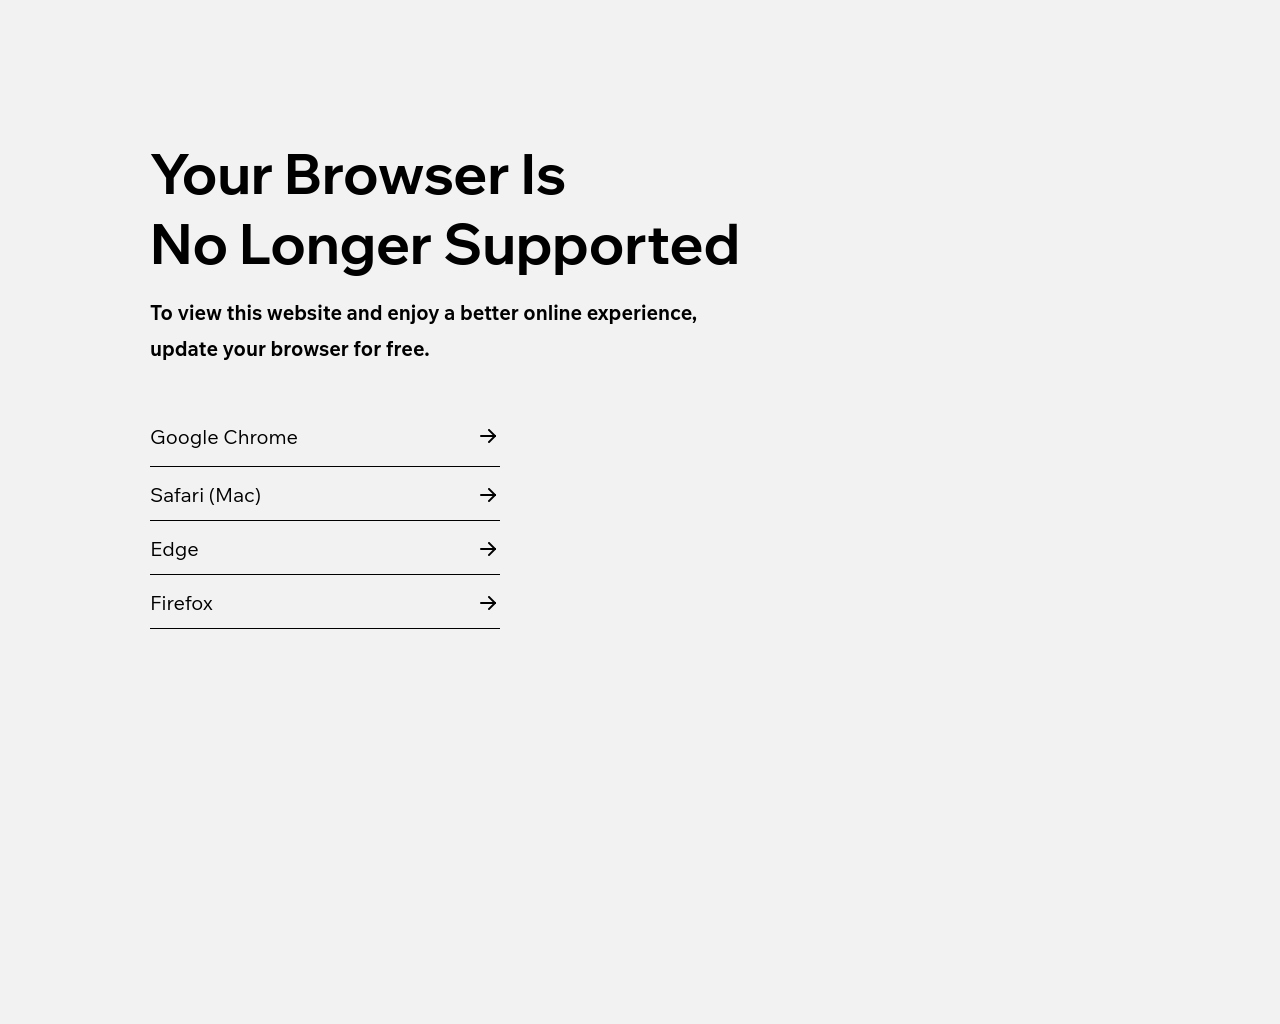 St Joseph's Boys' School Website